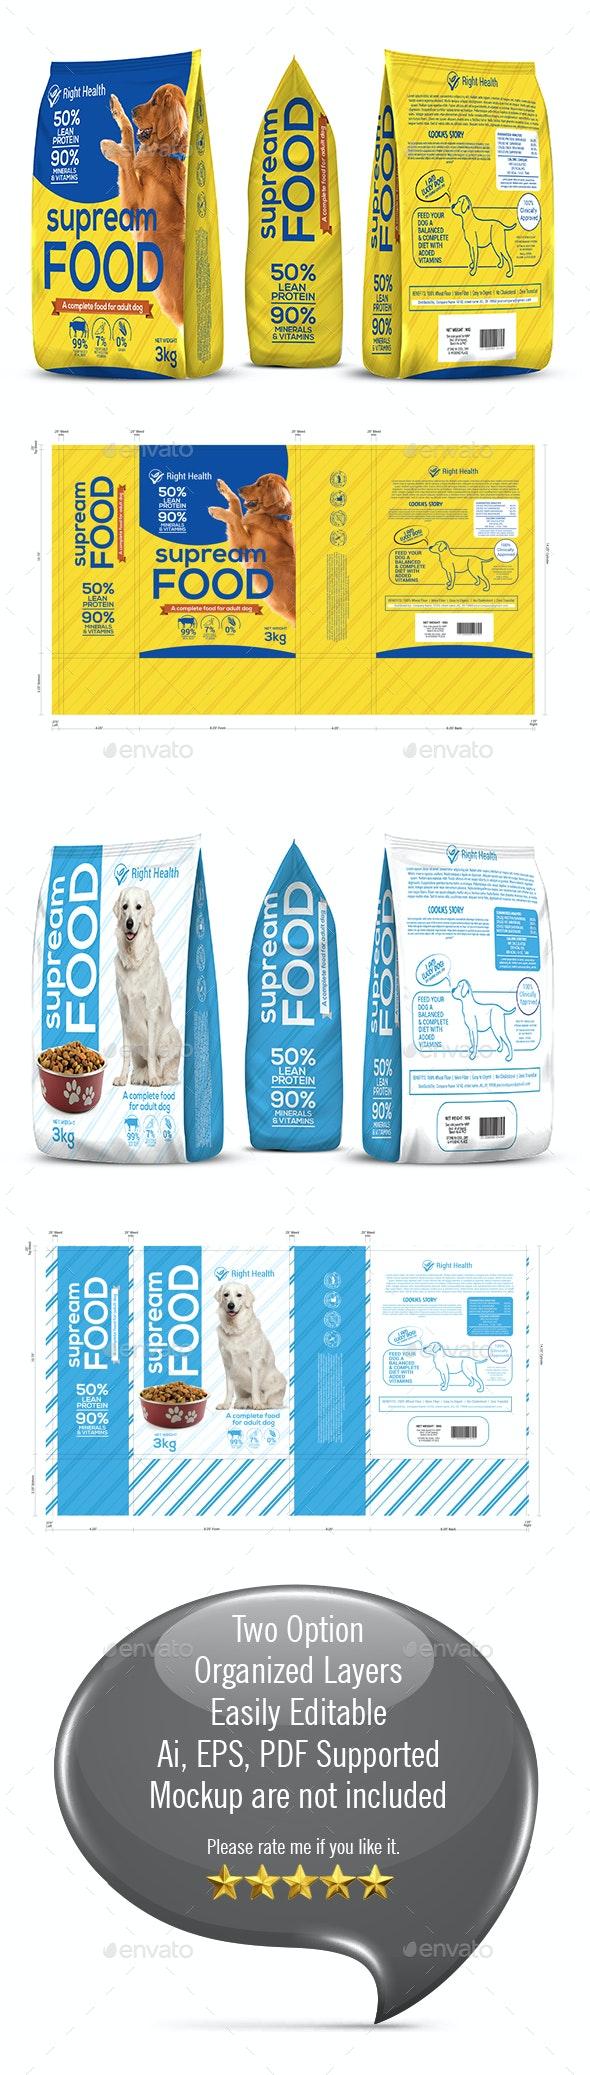 Dog Supplement Packaging Template-2